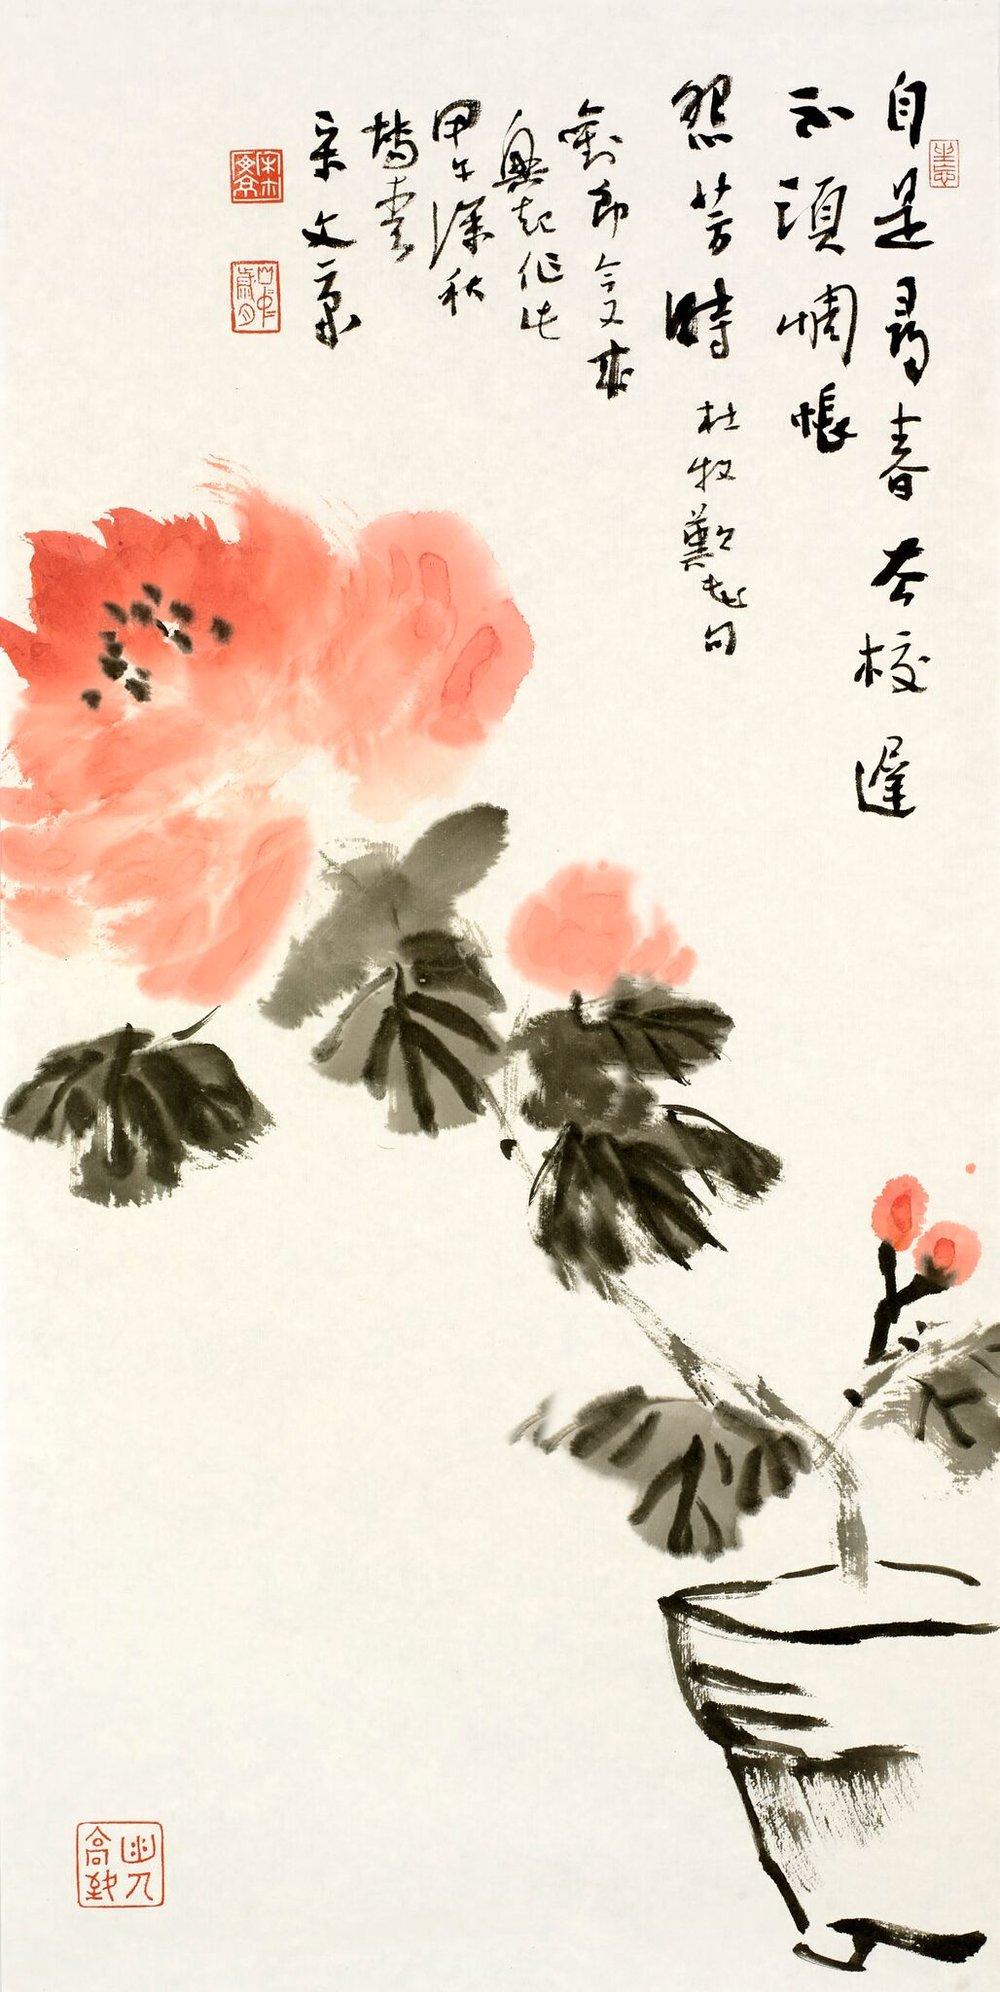 3 Song Wenjing Art.jpg